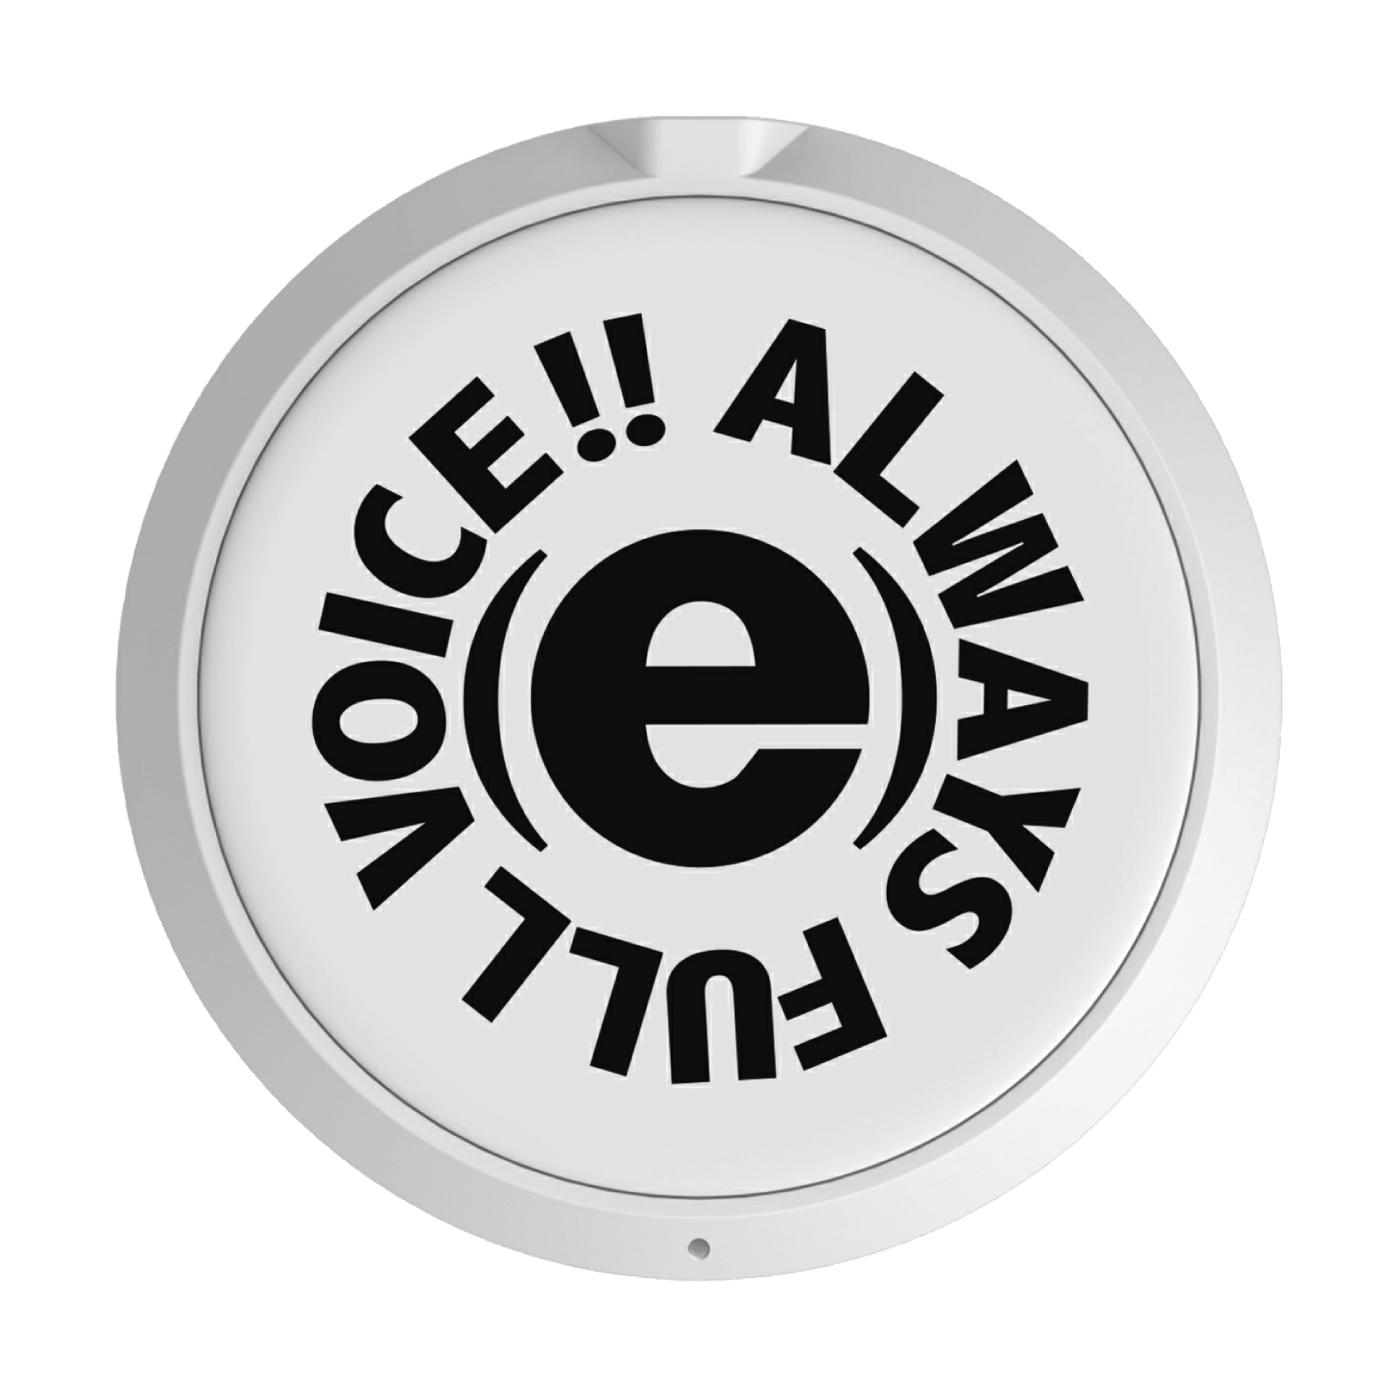 ALWAYS FULL VOICE!! 52 バッテリーチャージャー